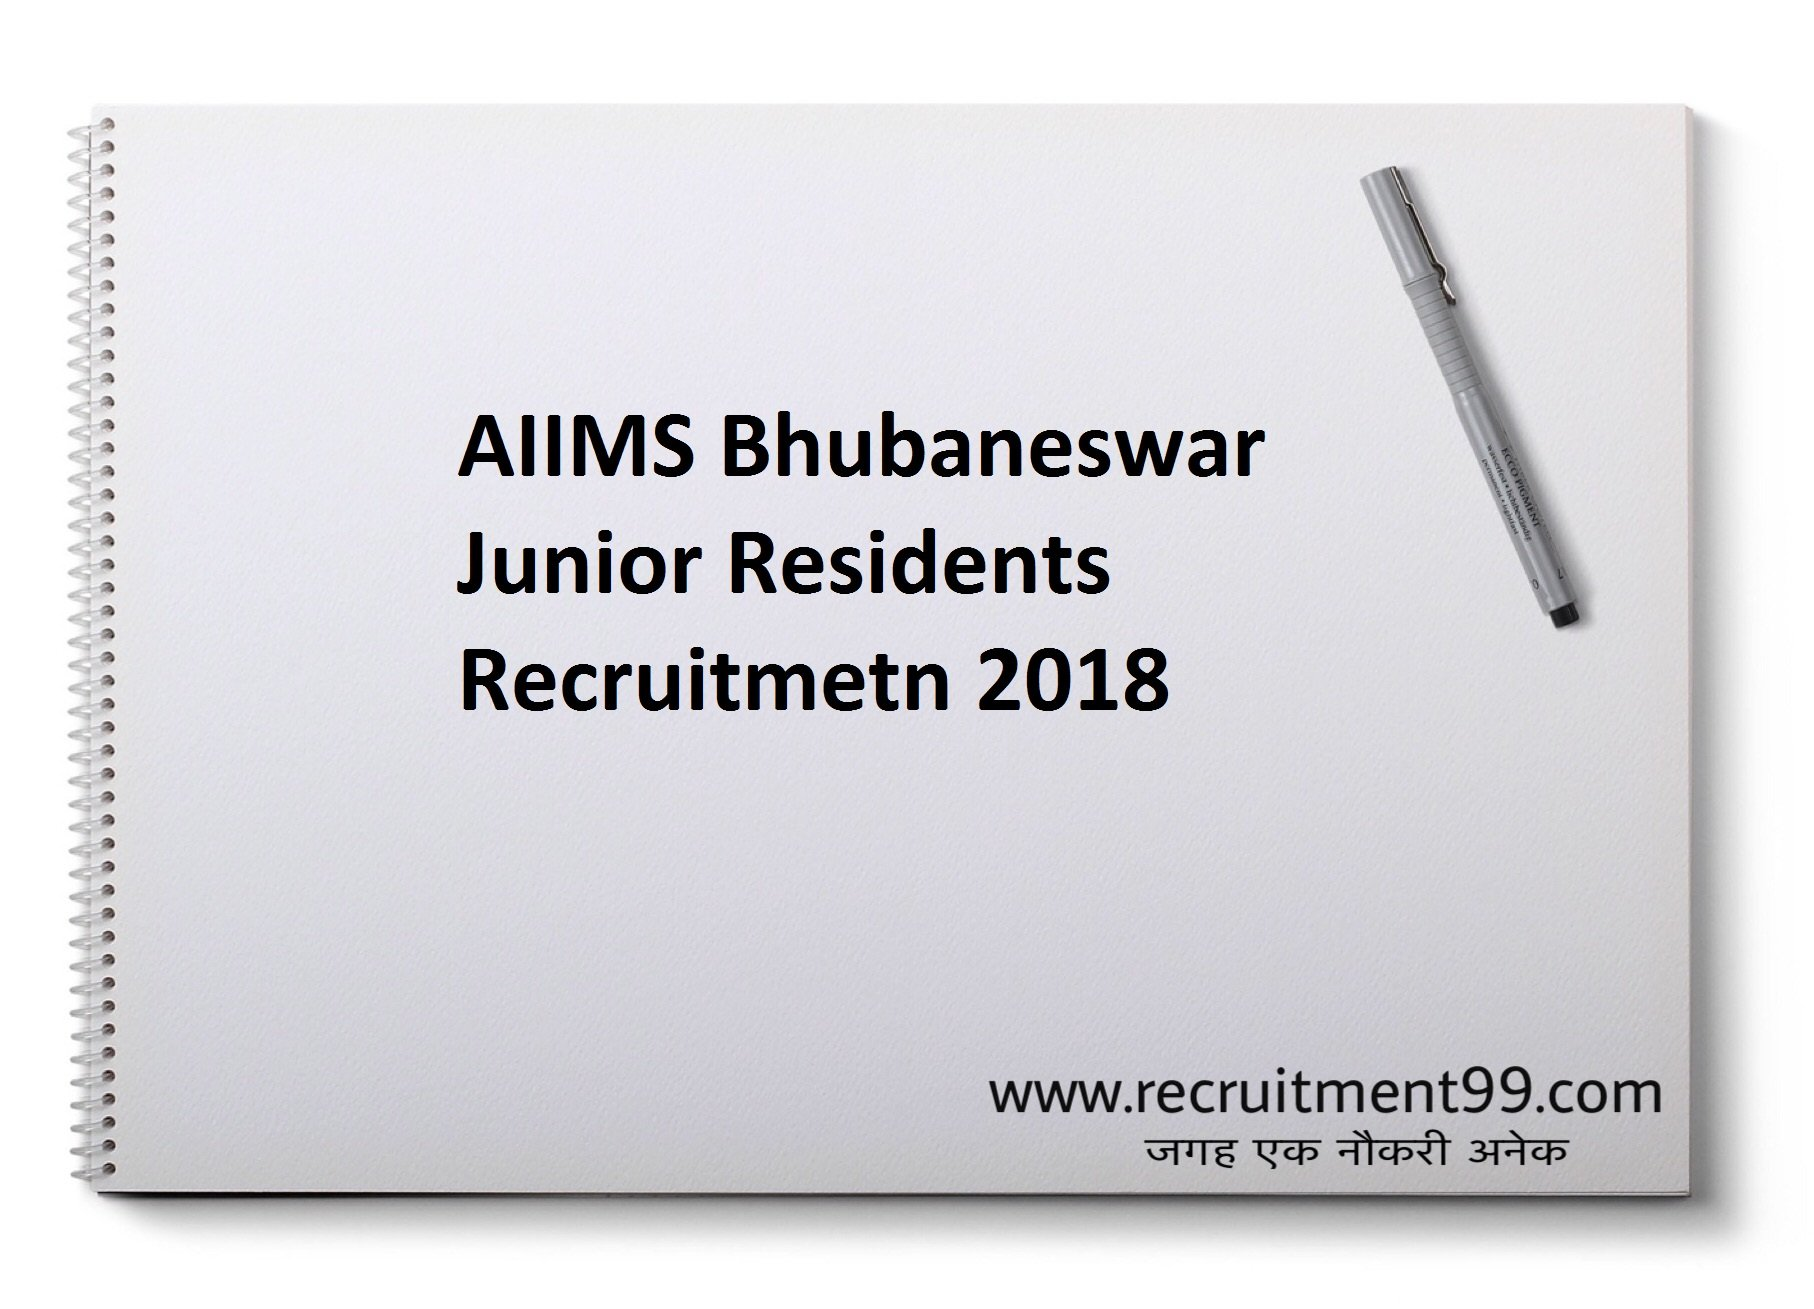 AIIMS Bhubaneswar Junior Residents Recruitment Admit Card Result 2018